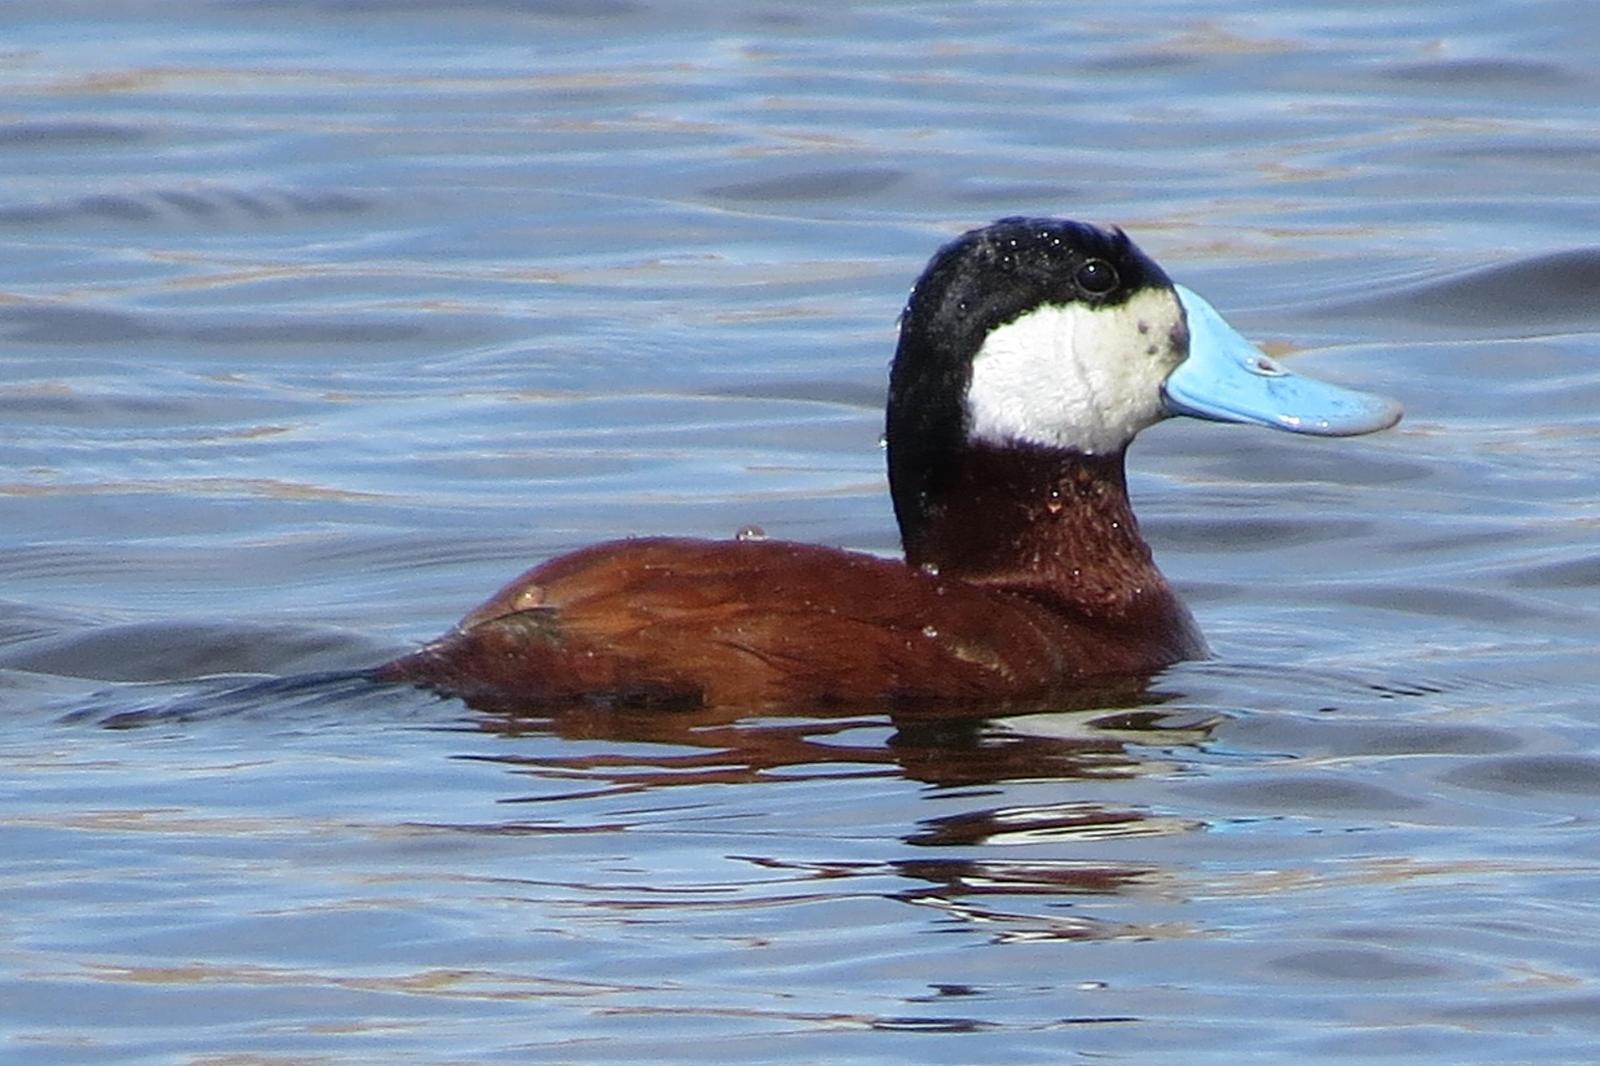 Ruddy Duck Photo by Enid Bachman